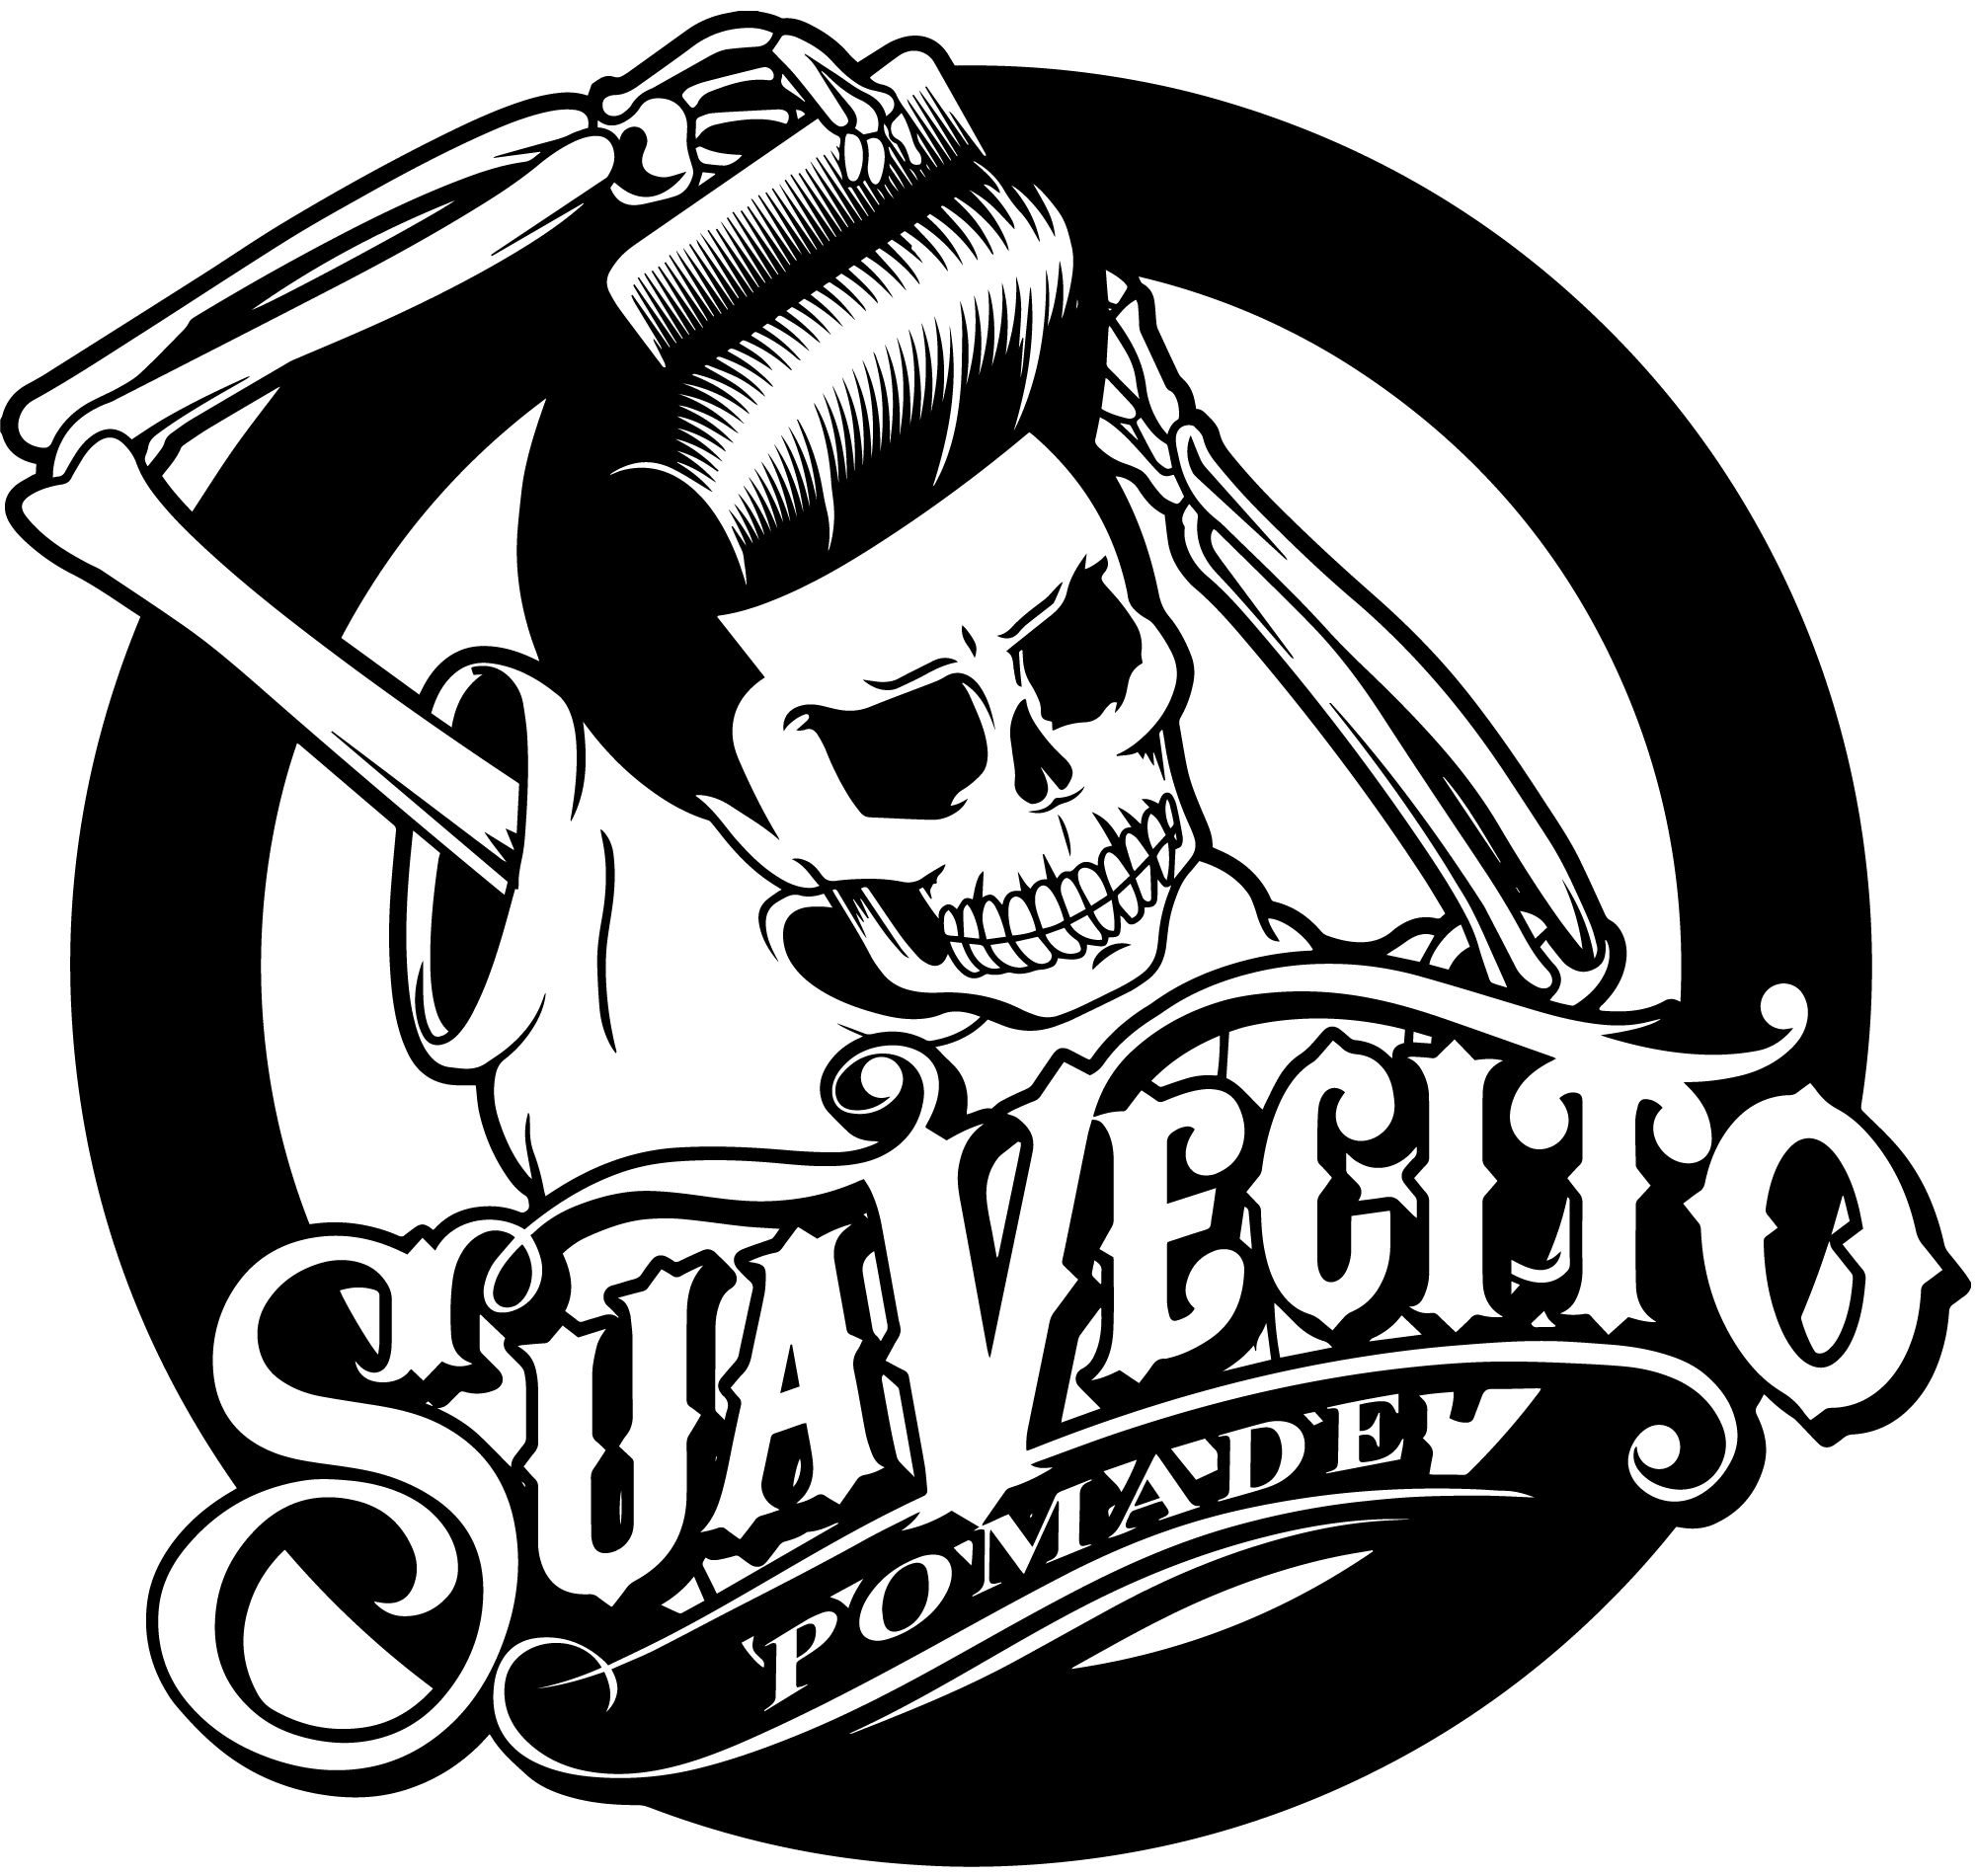 Suavecito Logo